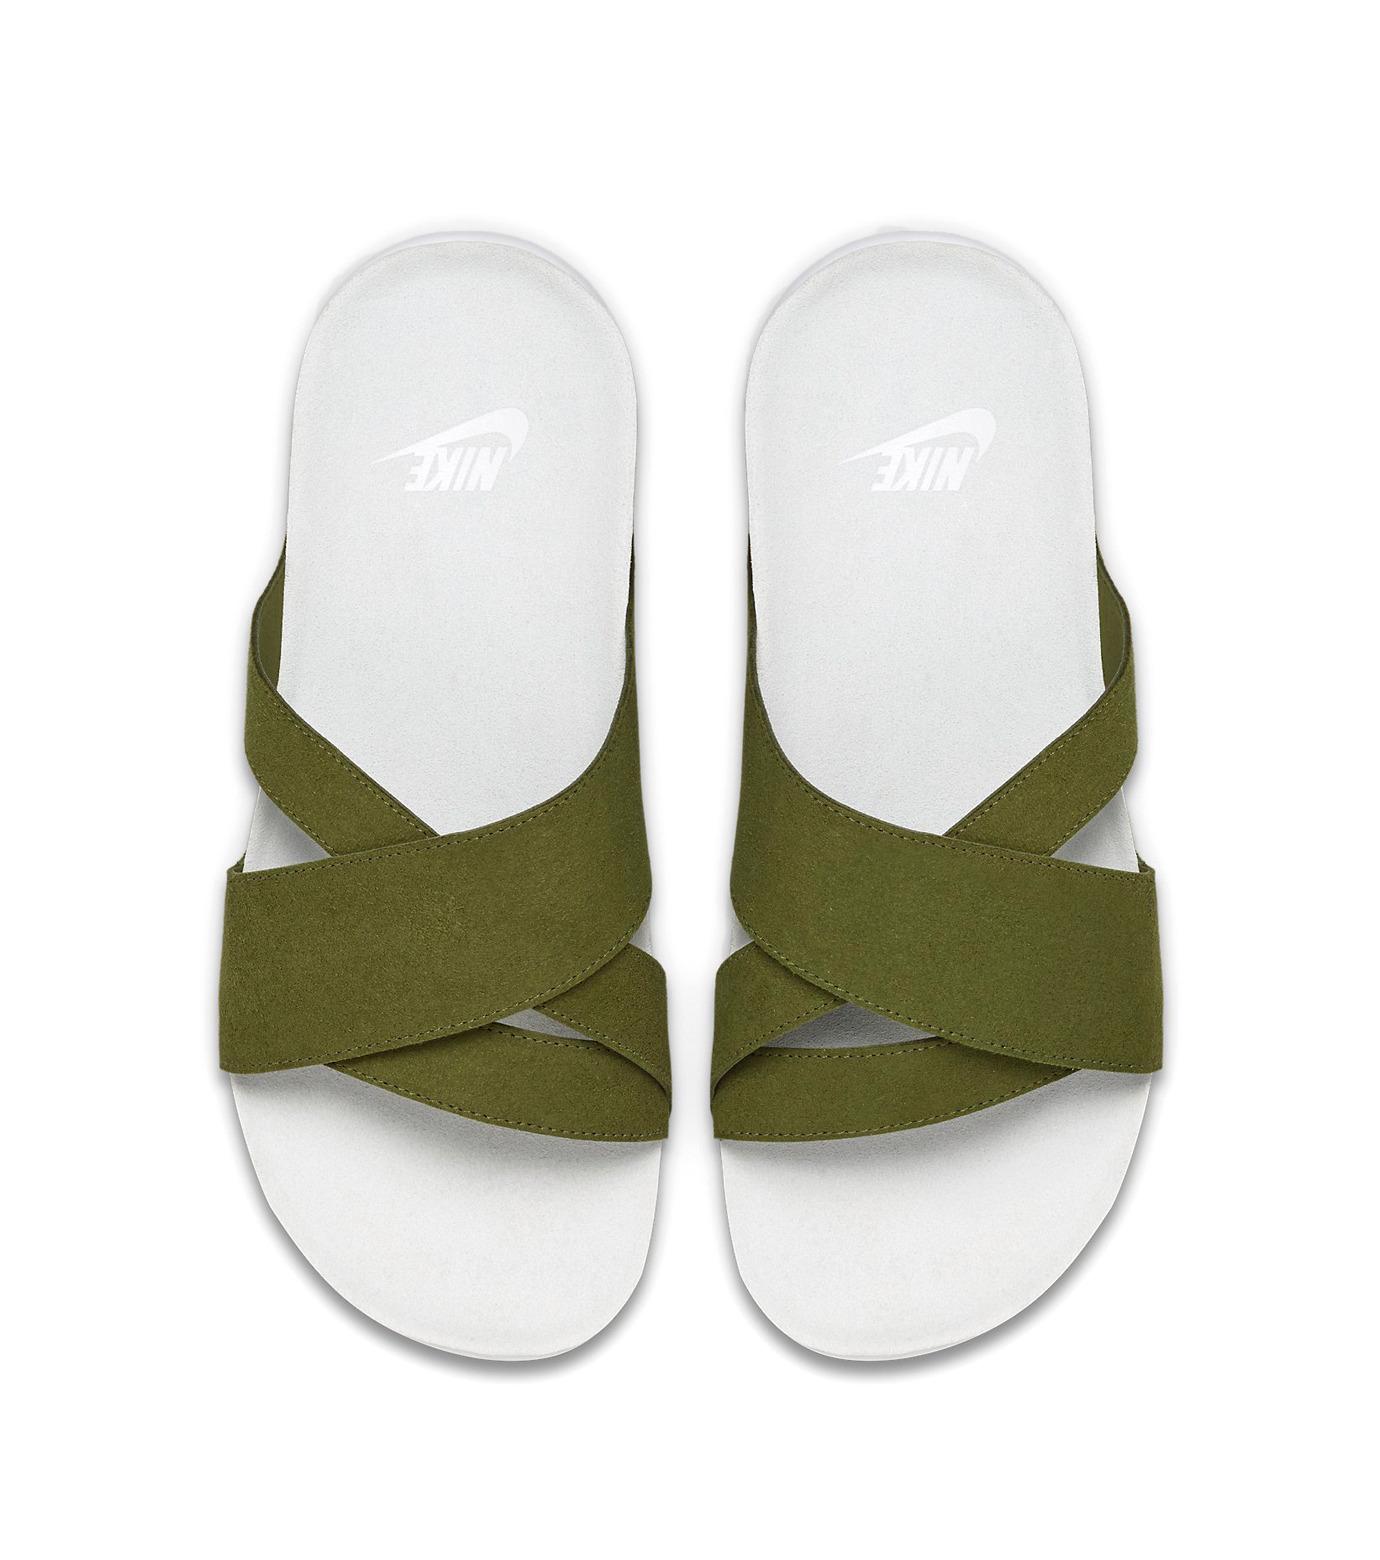 NIKE(ナイキ)のTAUPO-GREEN(シューズ/shoes)-849756-310-22 拡大詳細画像4